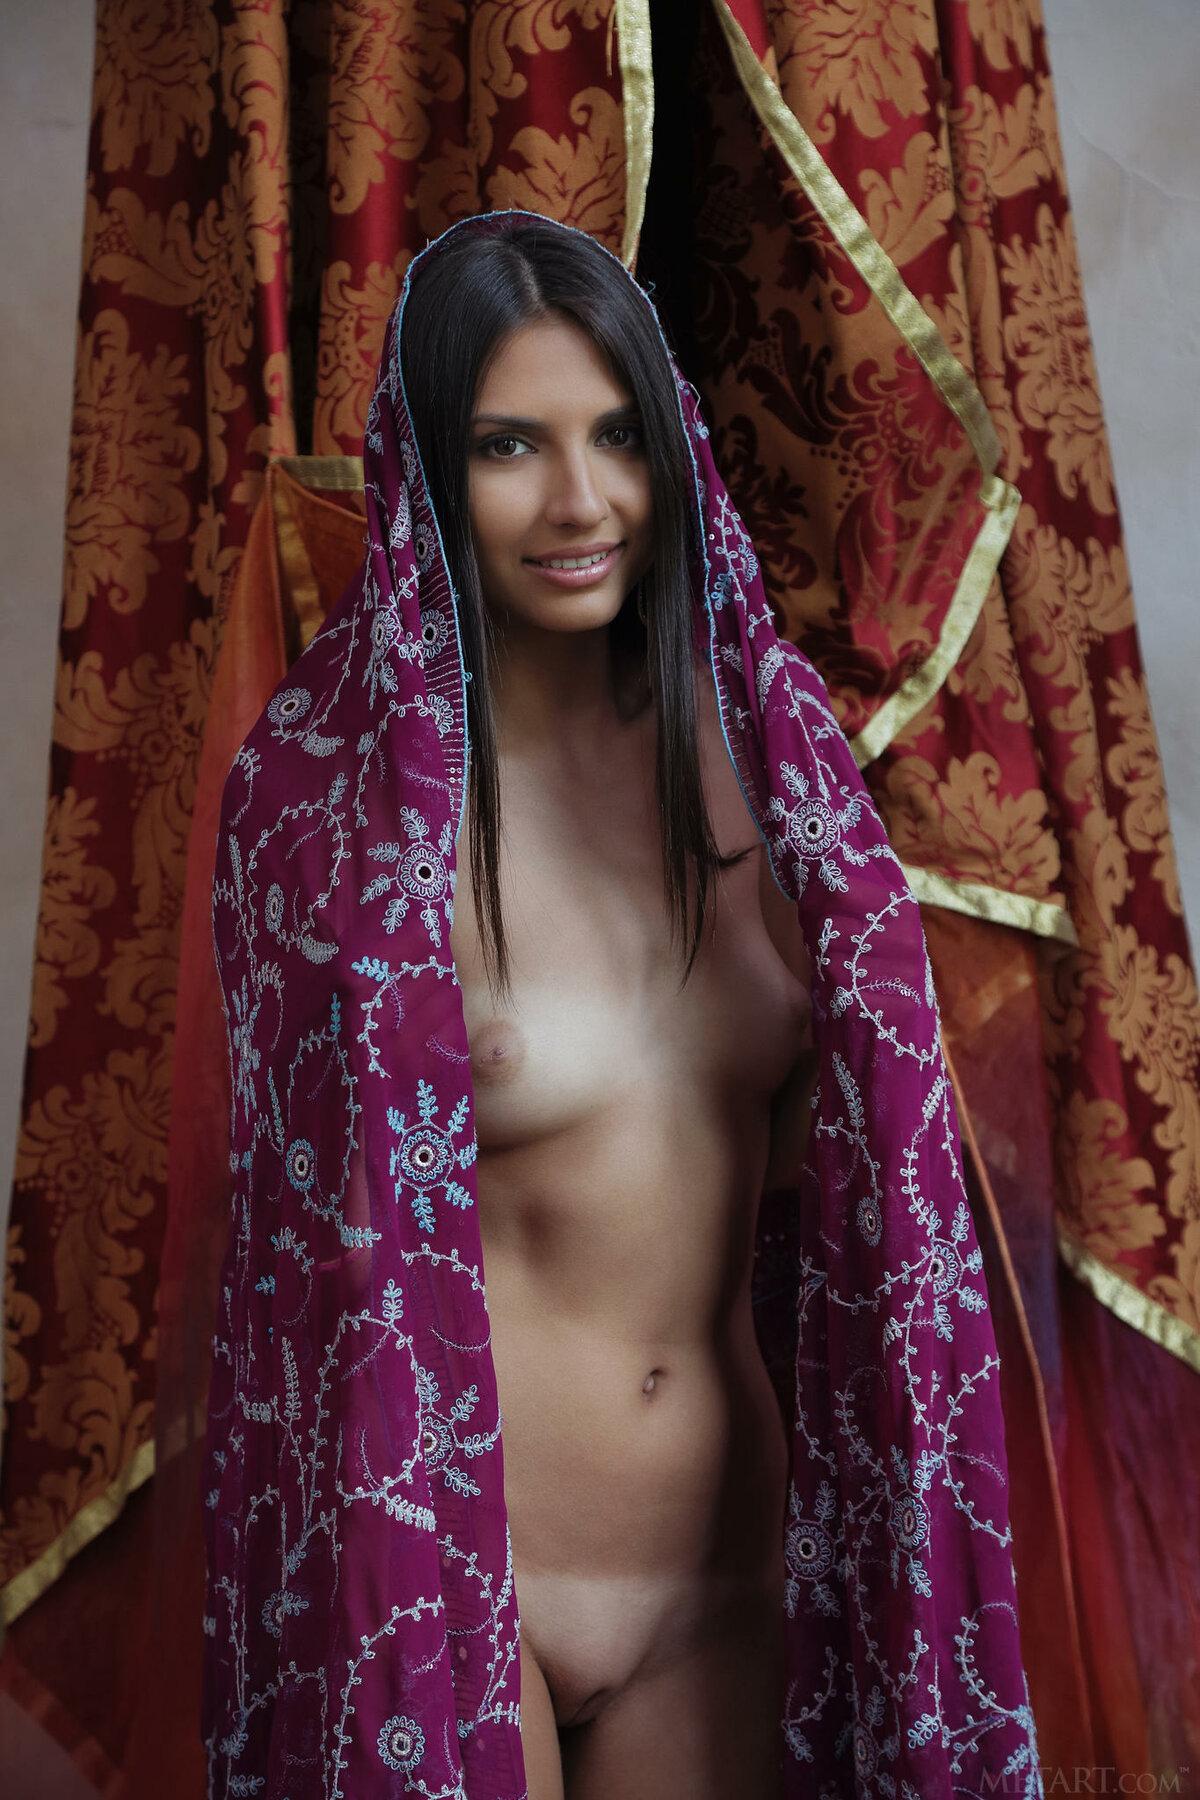 Girl completely naked arab, nude girl in airplane bathroom